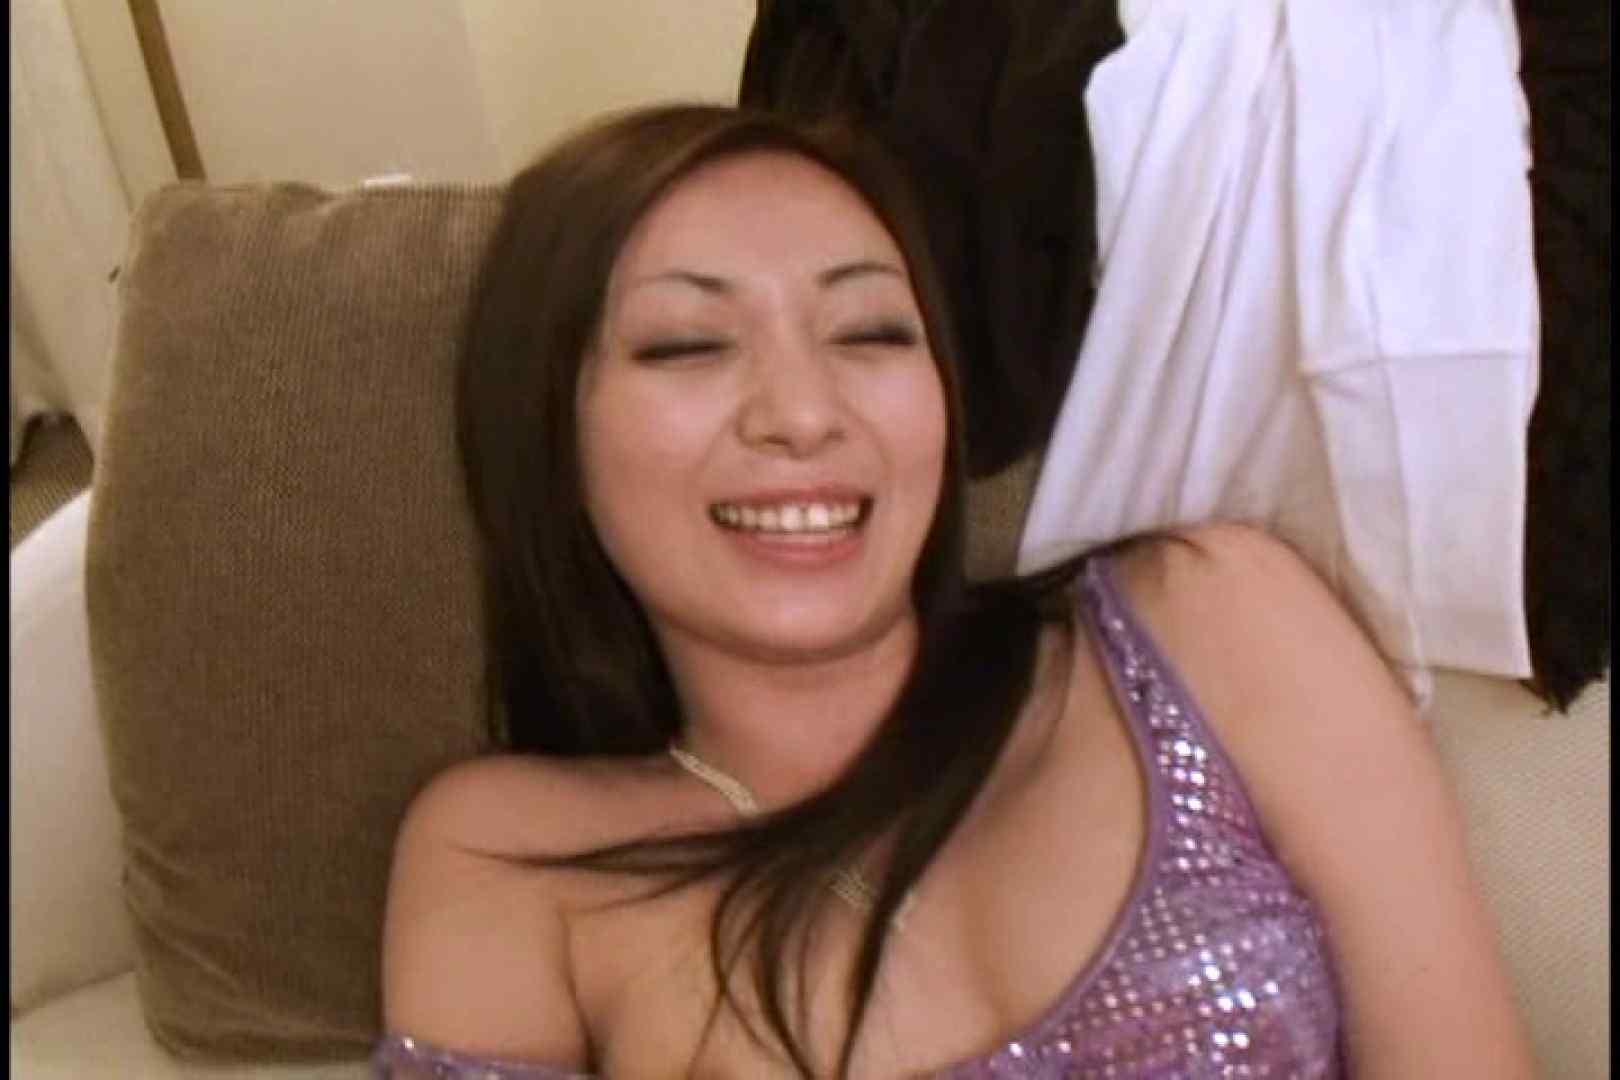 JDハンター全国ツアー vol.044 後編 女子大生のエロ動画  94PIX 74